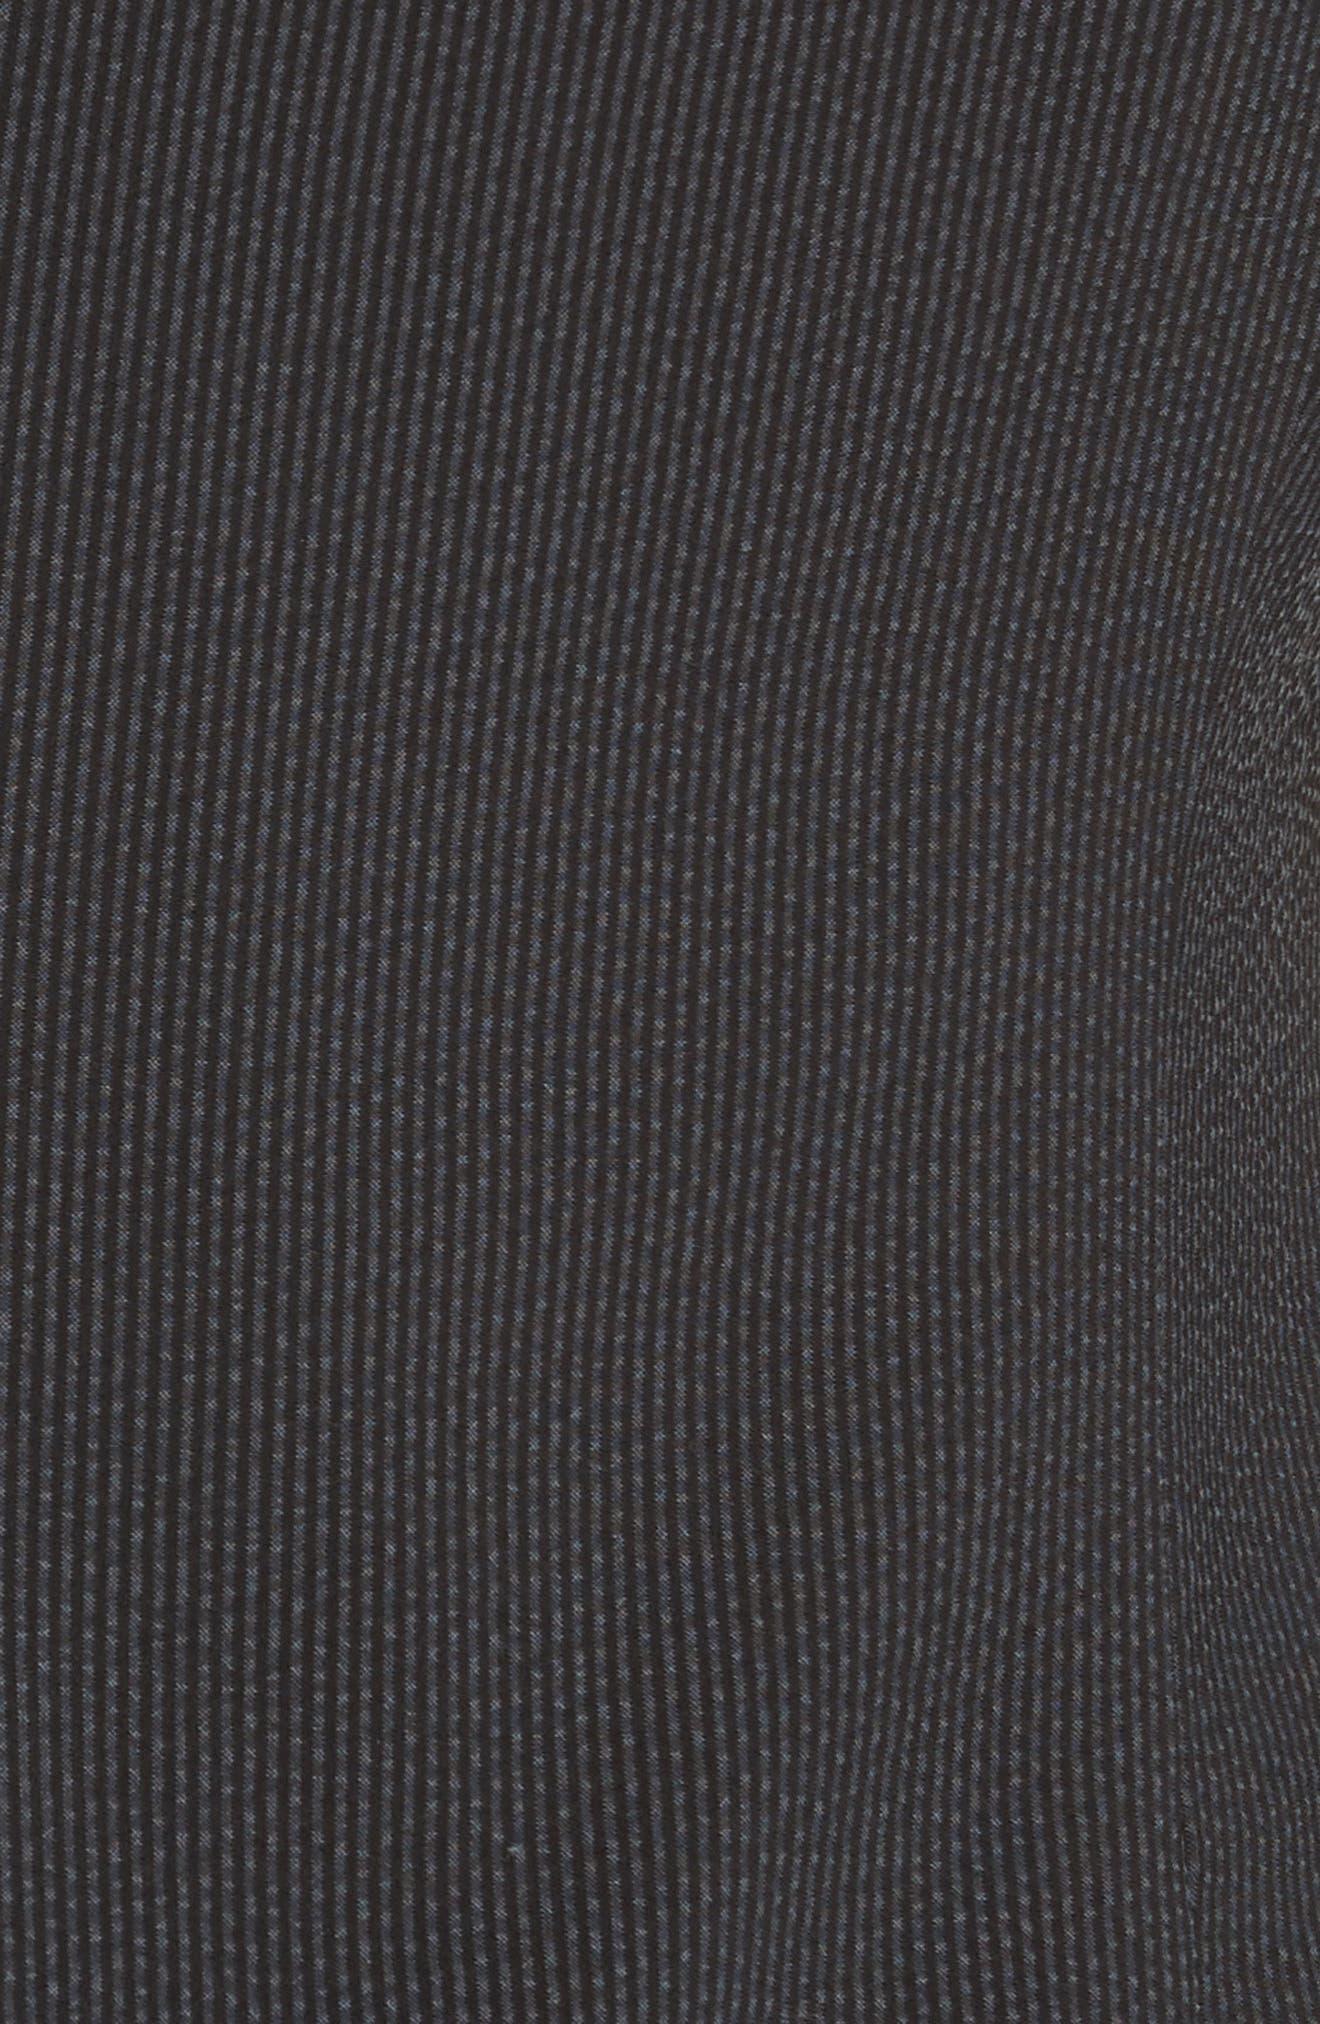 M Line Trim Fit Stretch Seersucker Wool Blend Suit,                             Alternate thumbnail 7, color,                             Grey